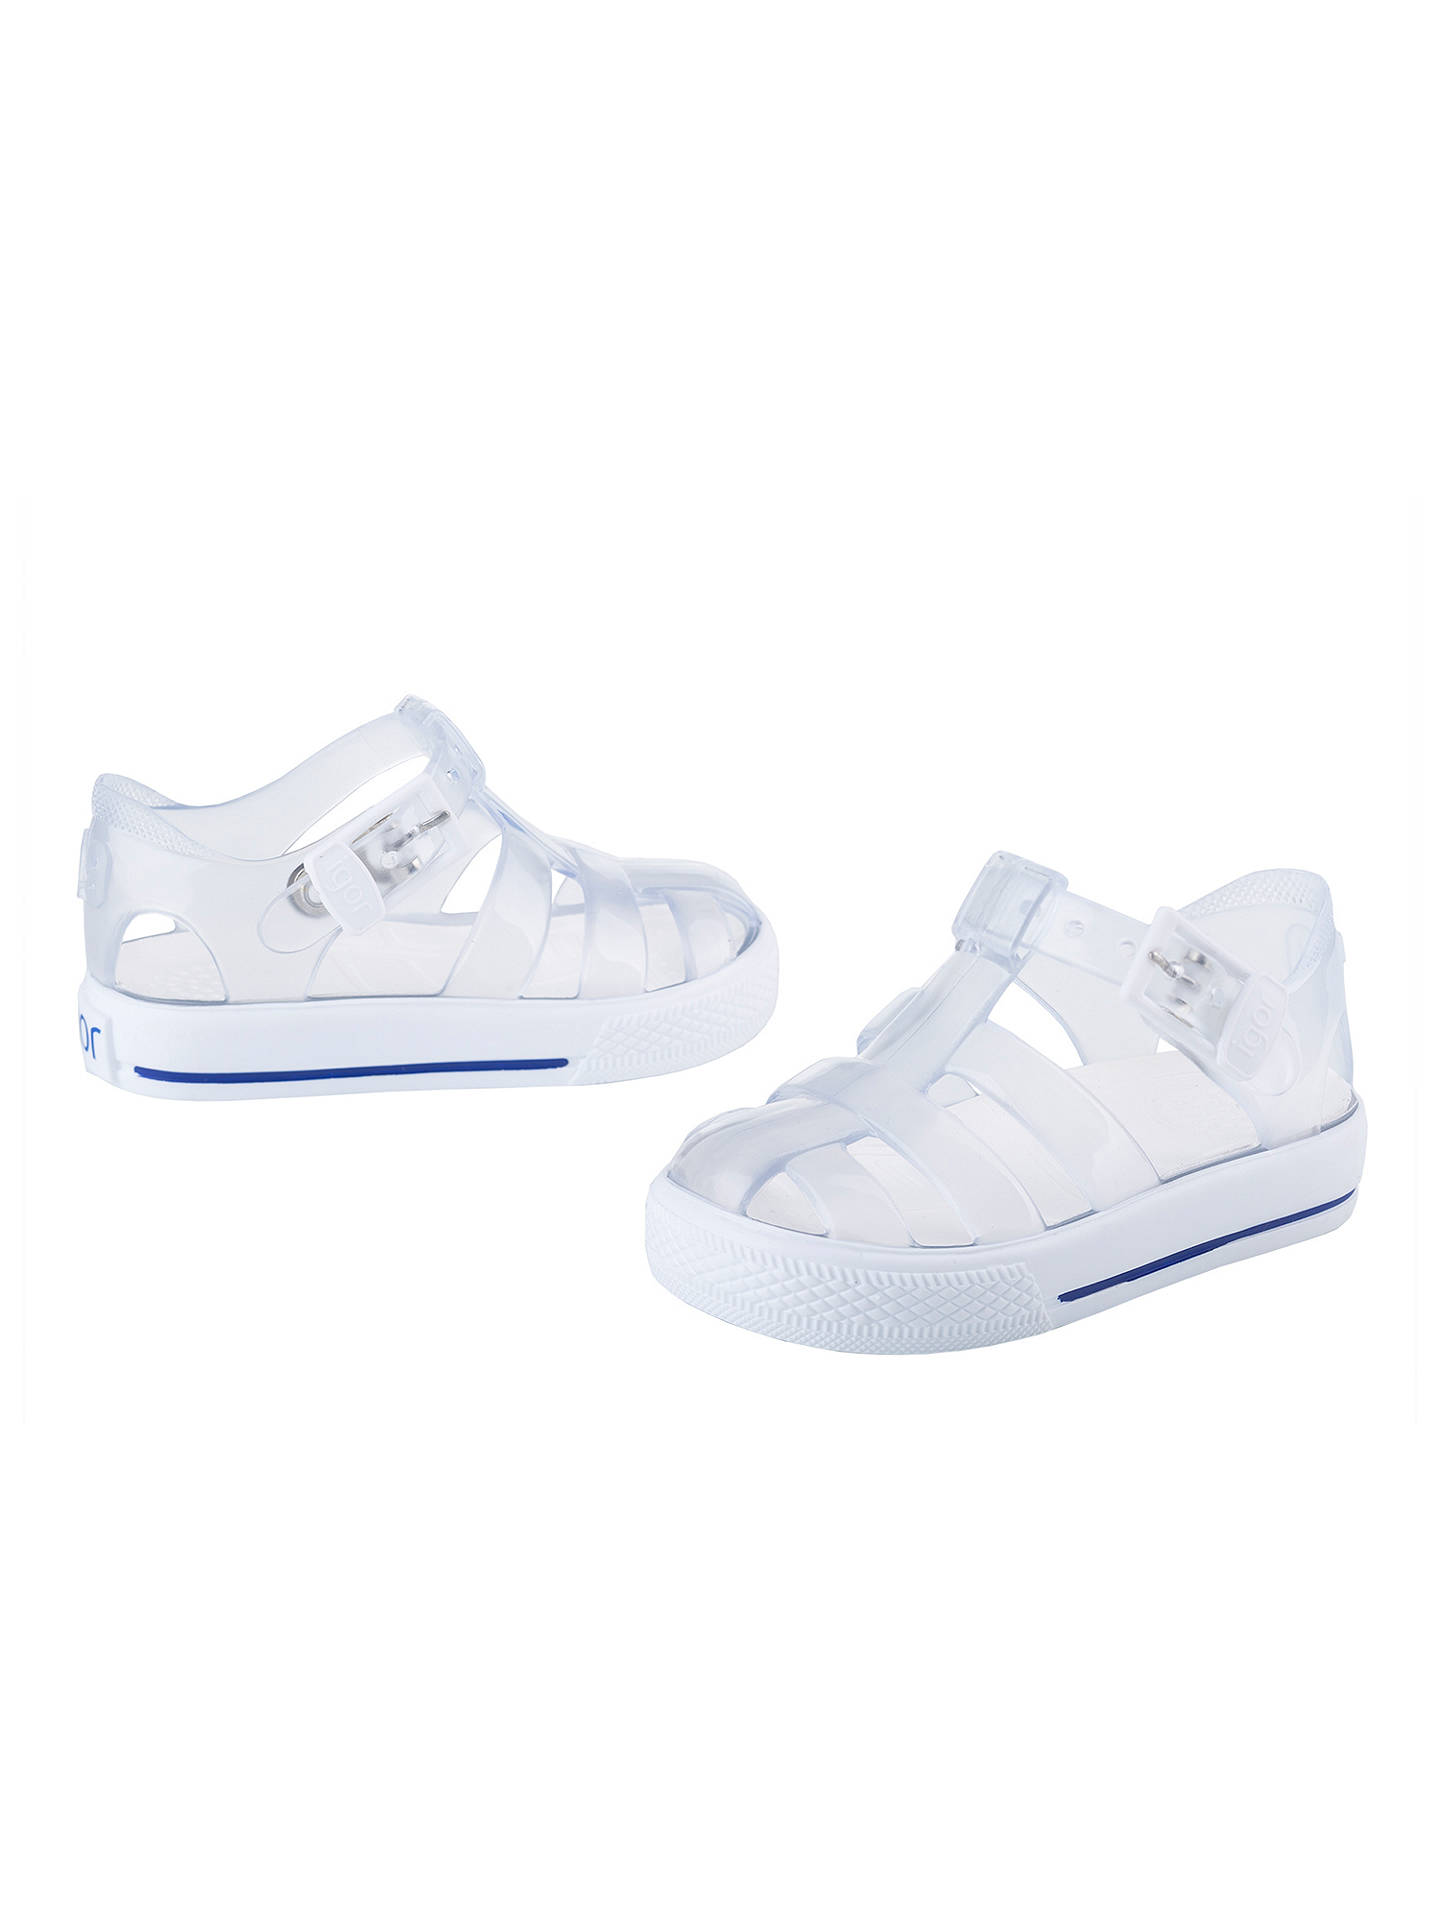 fba1e7e34357 IGOR Children s Tenis Jelly Shoes at John Lewis   Partners